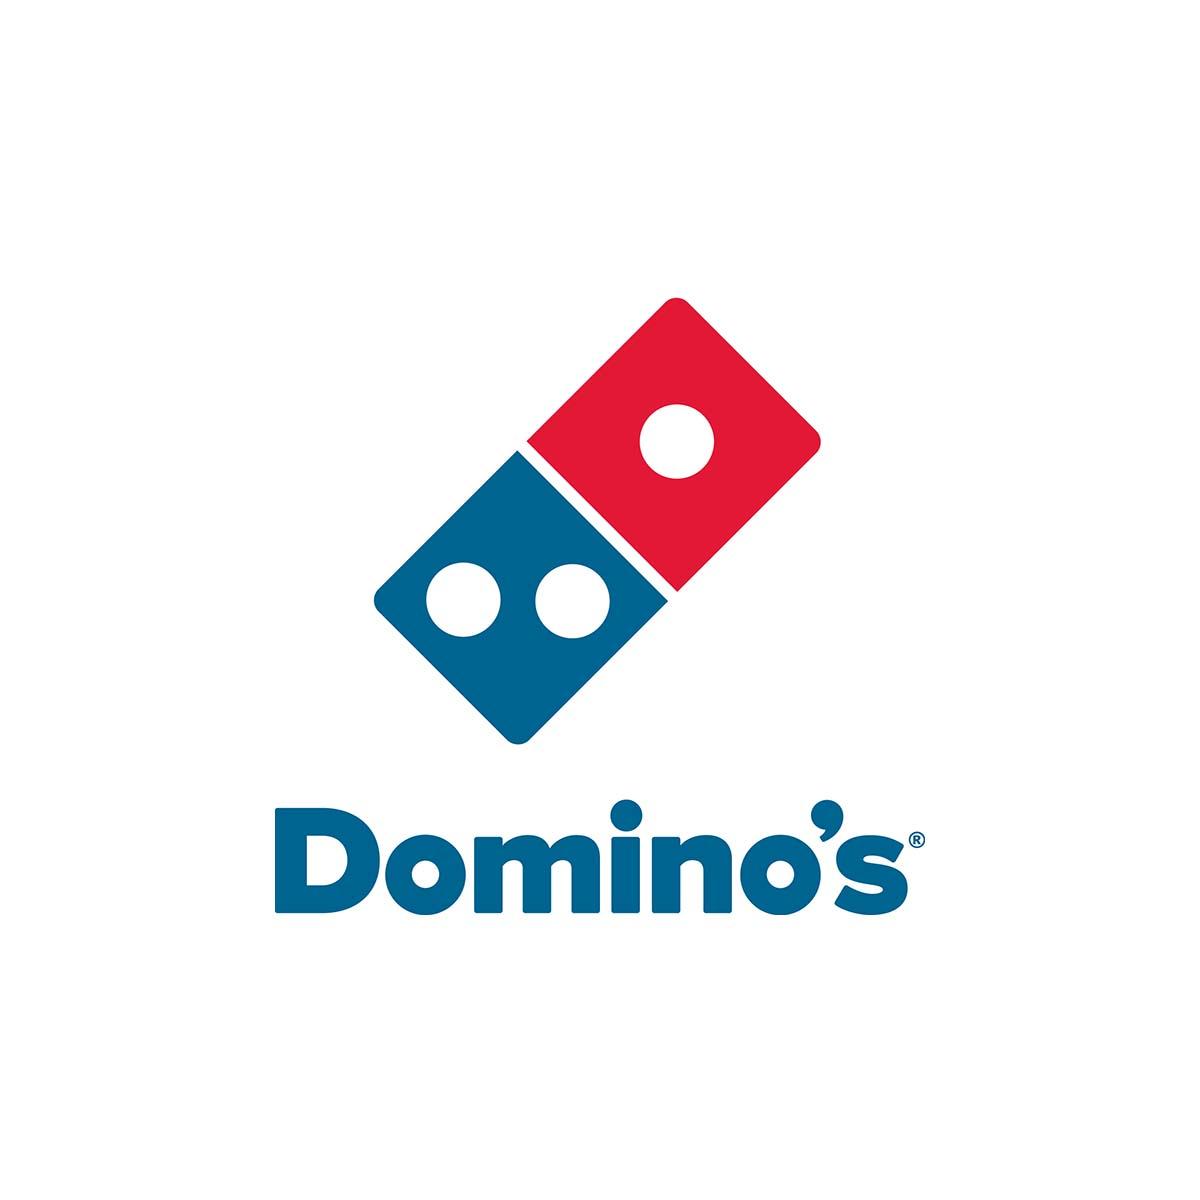 dominos brand